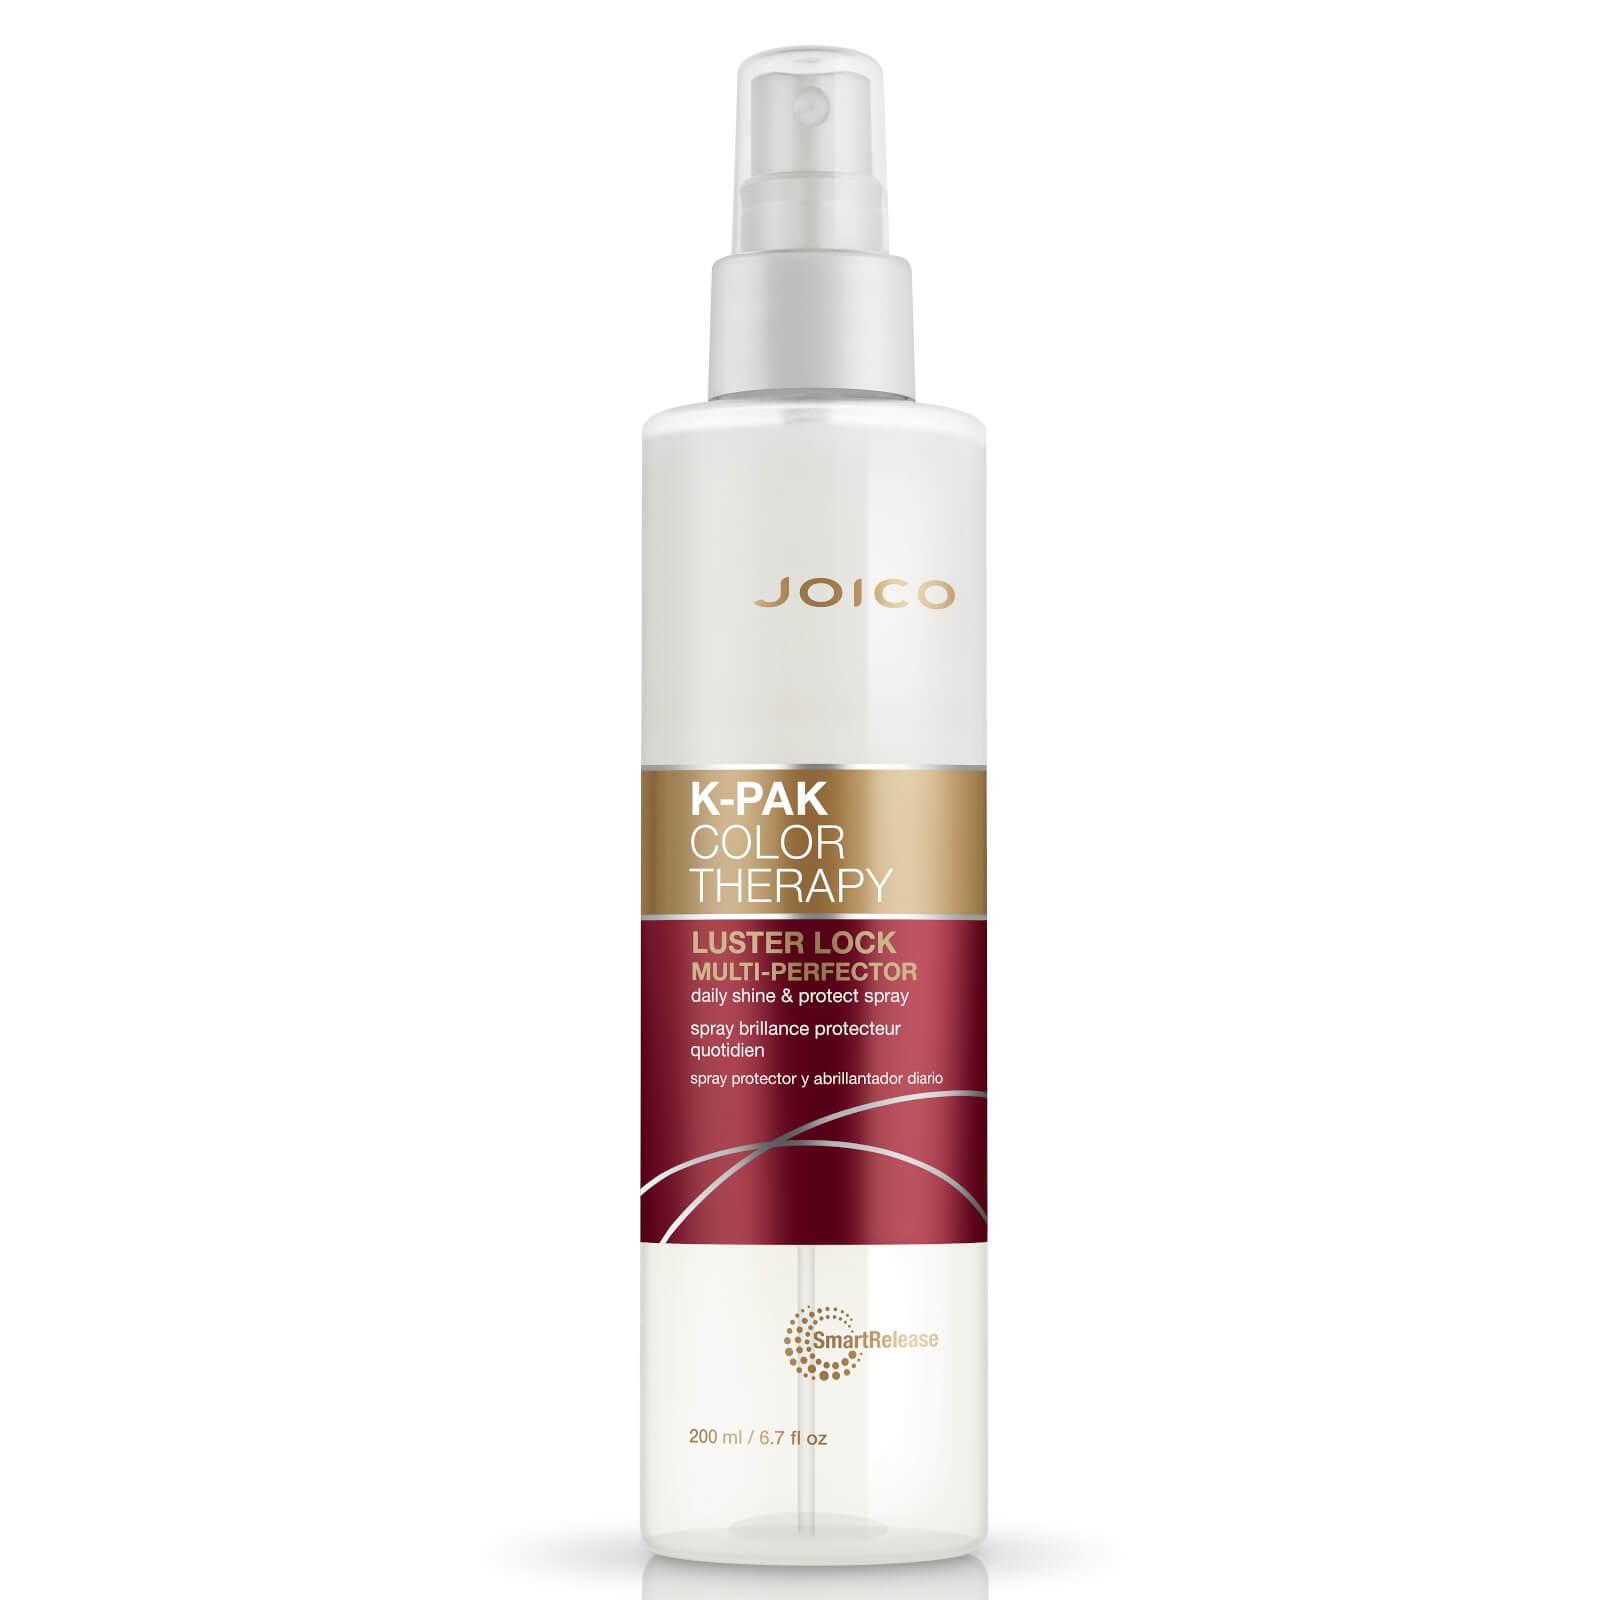 Купить Спрей-кондиционер для волос Joico K-Pak Color Therapy Luster Lock Multi-Perfector Daily Shine and Protect Spray 200 мл